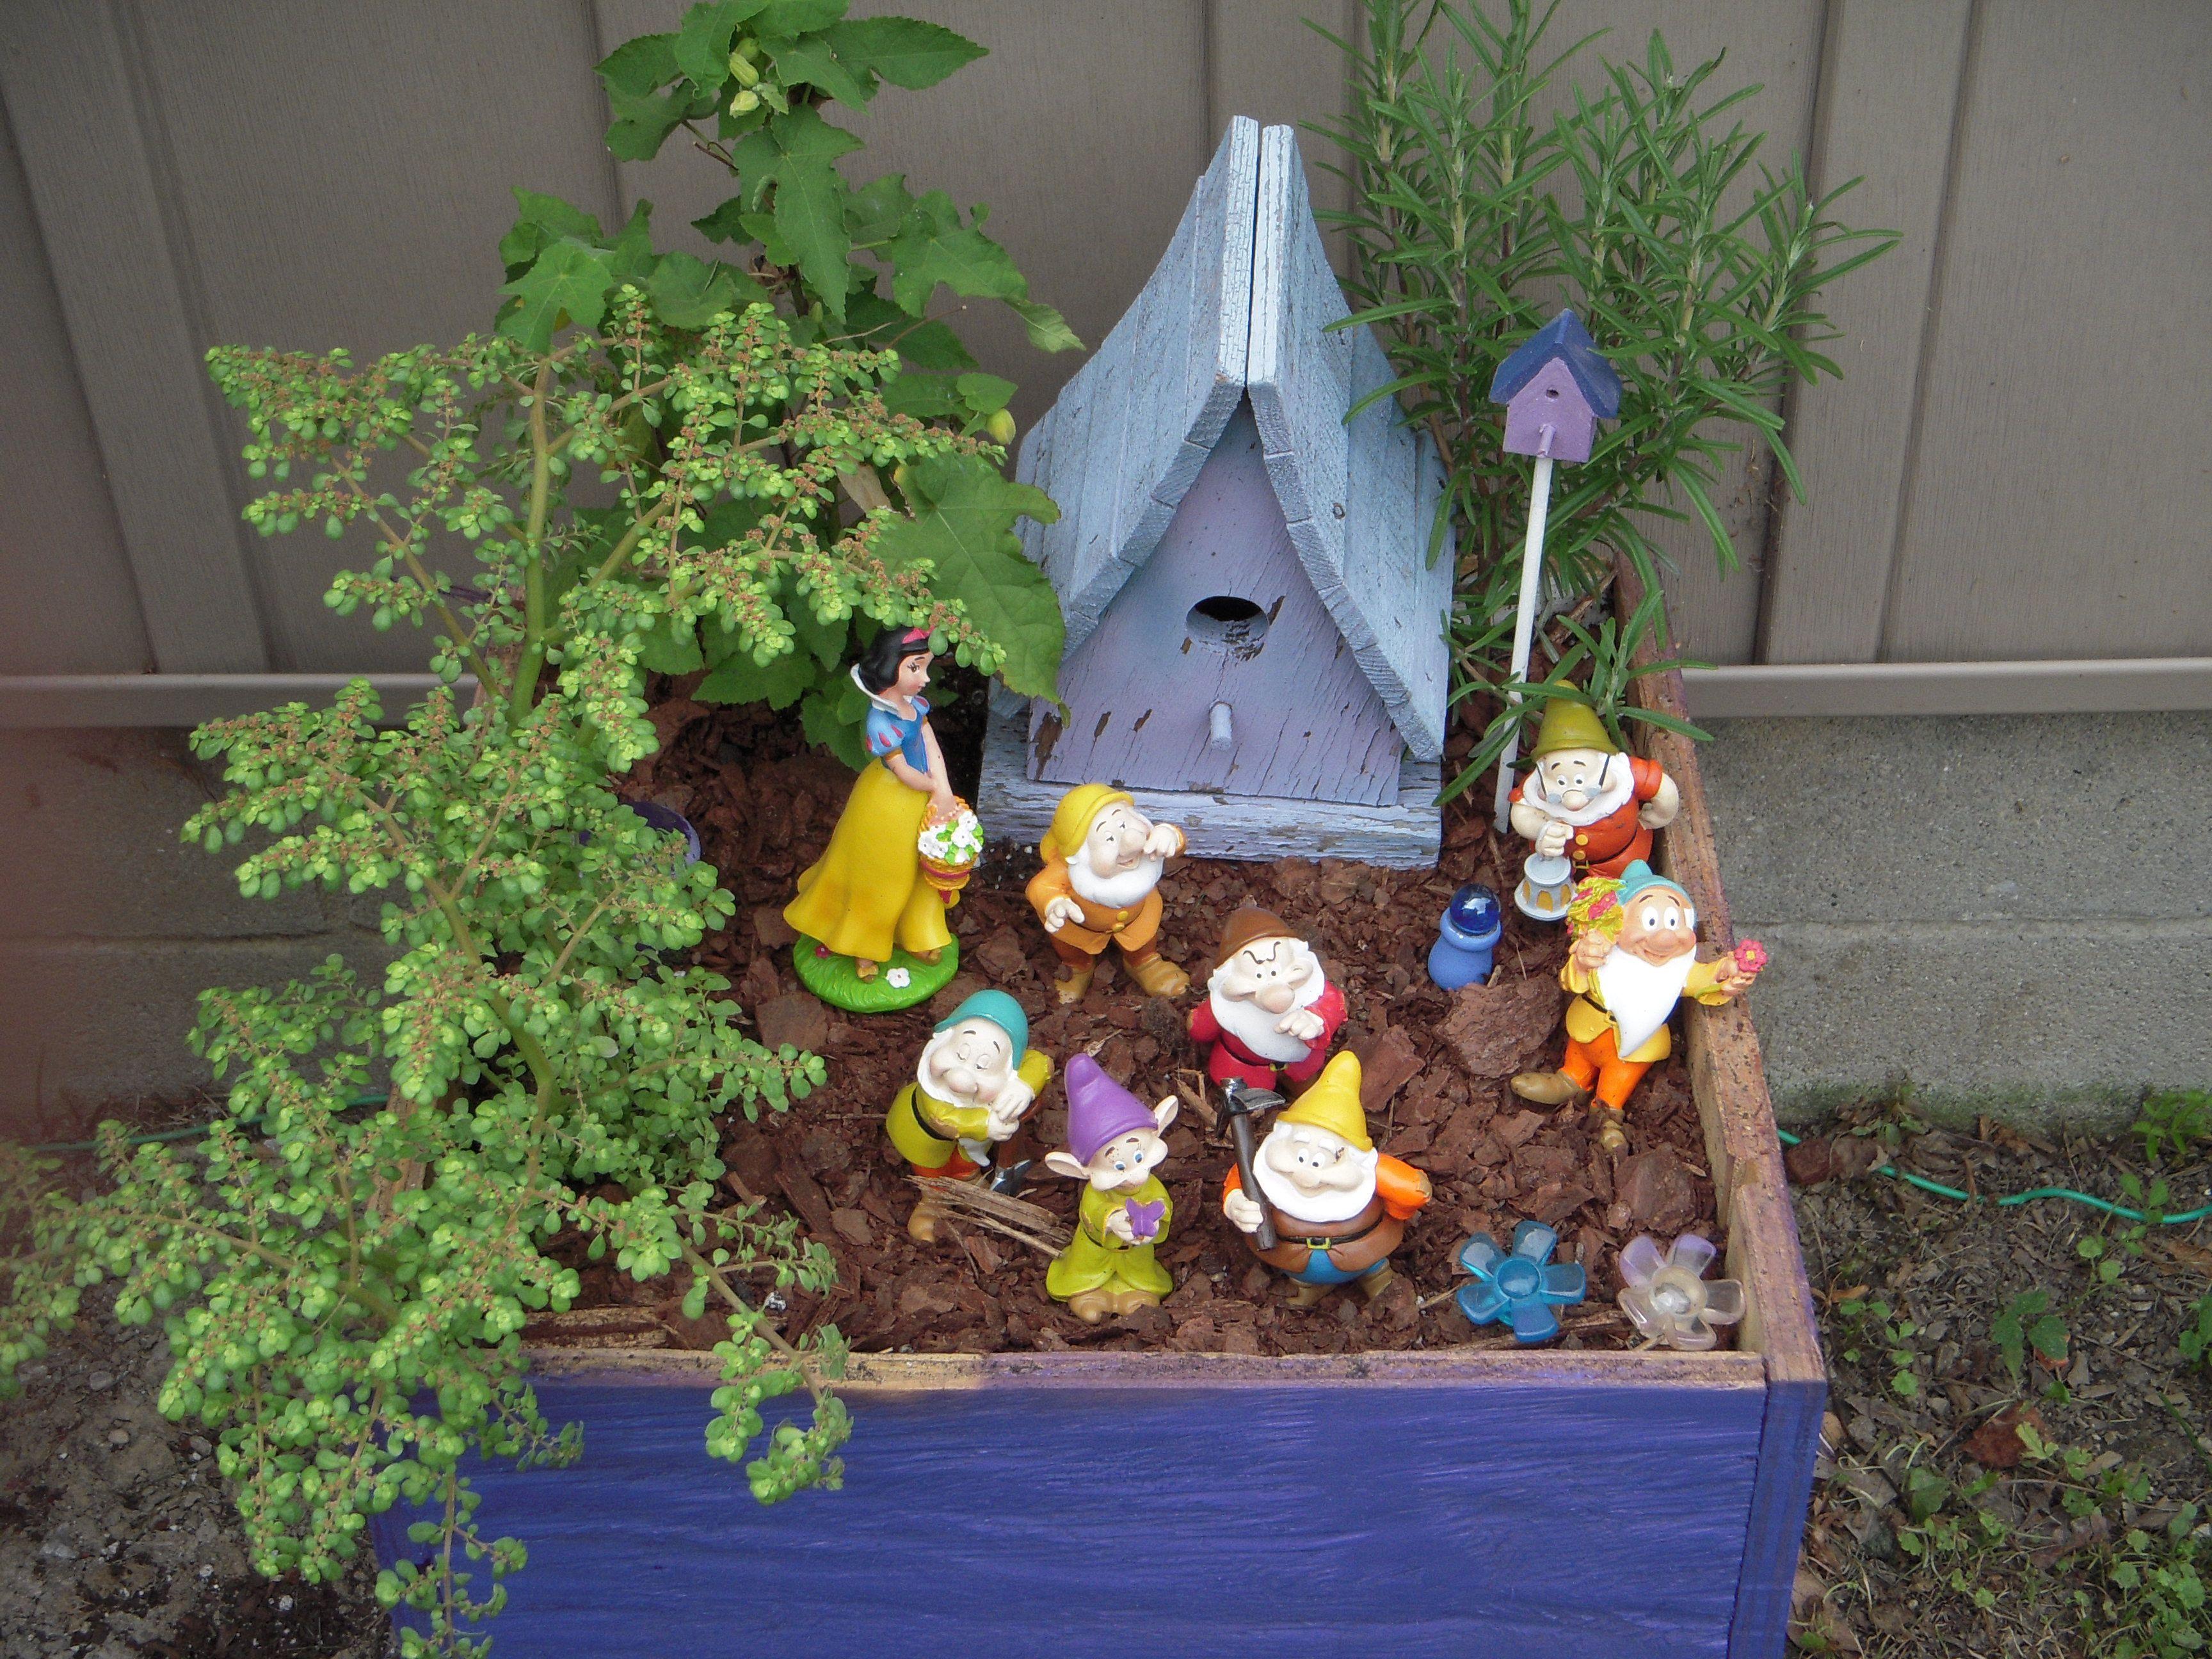 New Garden Ideas 2014 2014 snow white & 7 dwarfs fairy garden | a. miniature fairy